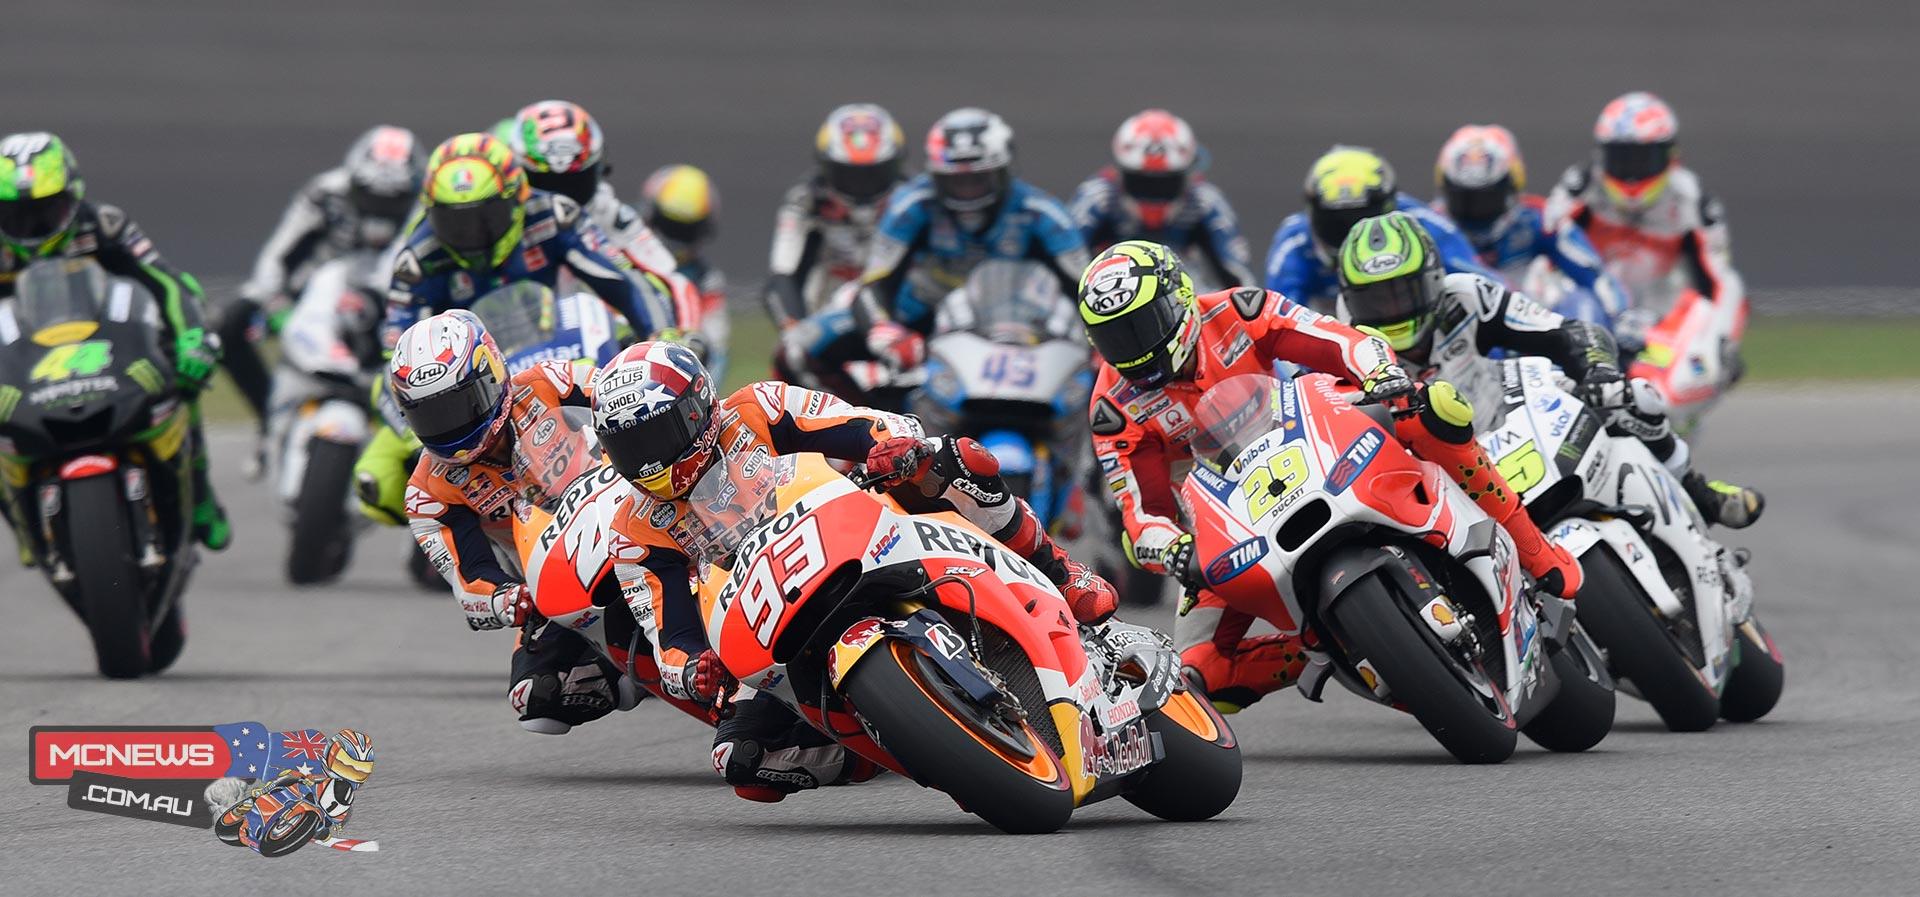 MotoGP Indy 2015 Start